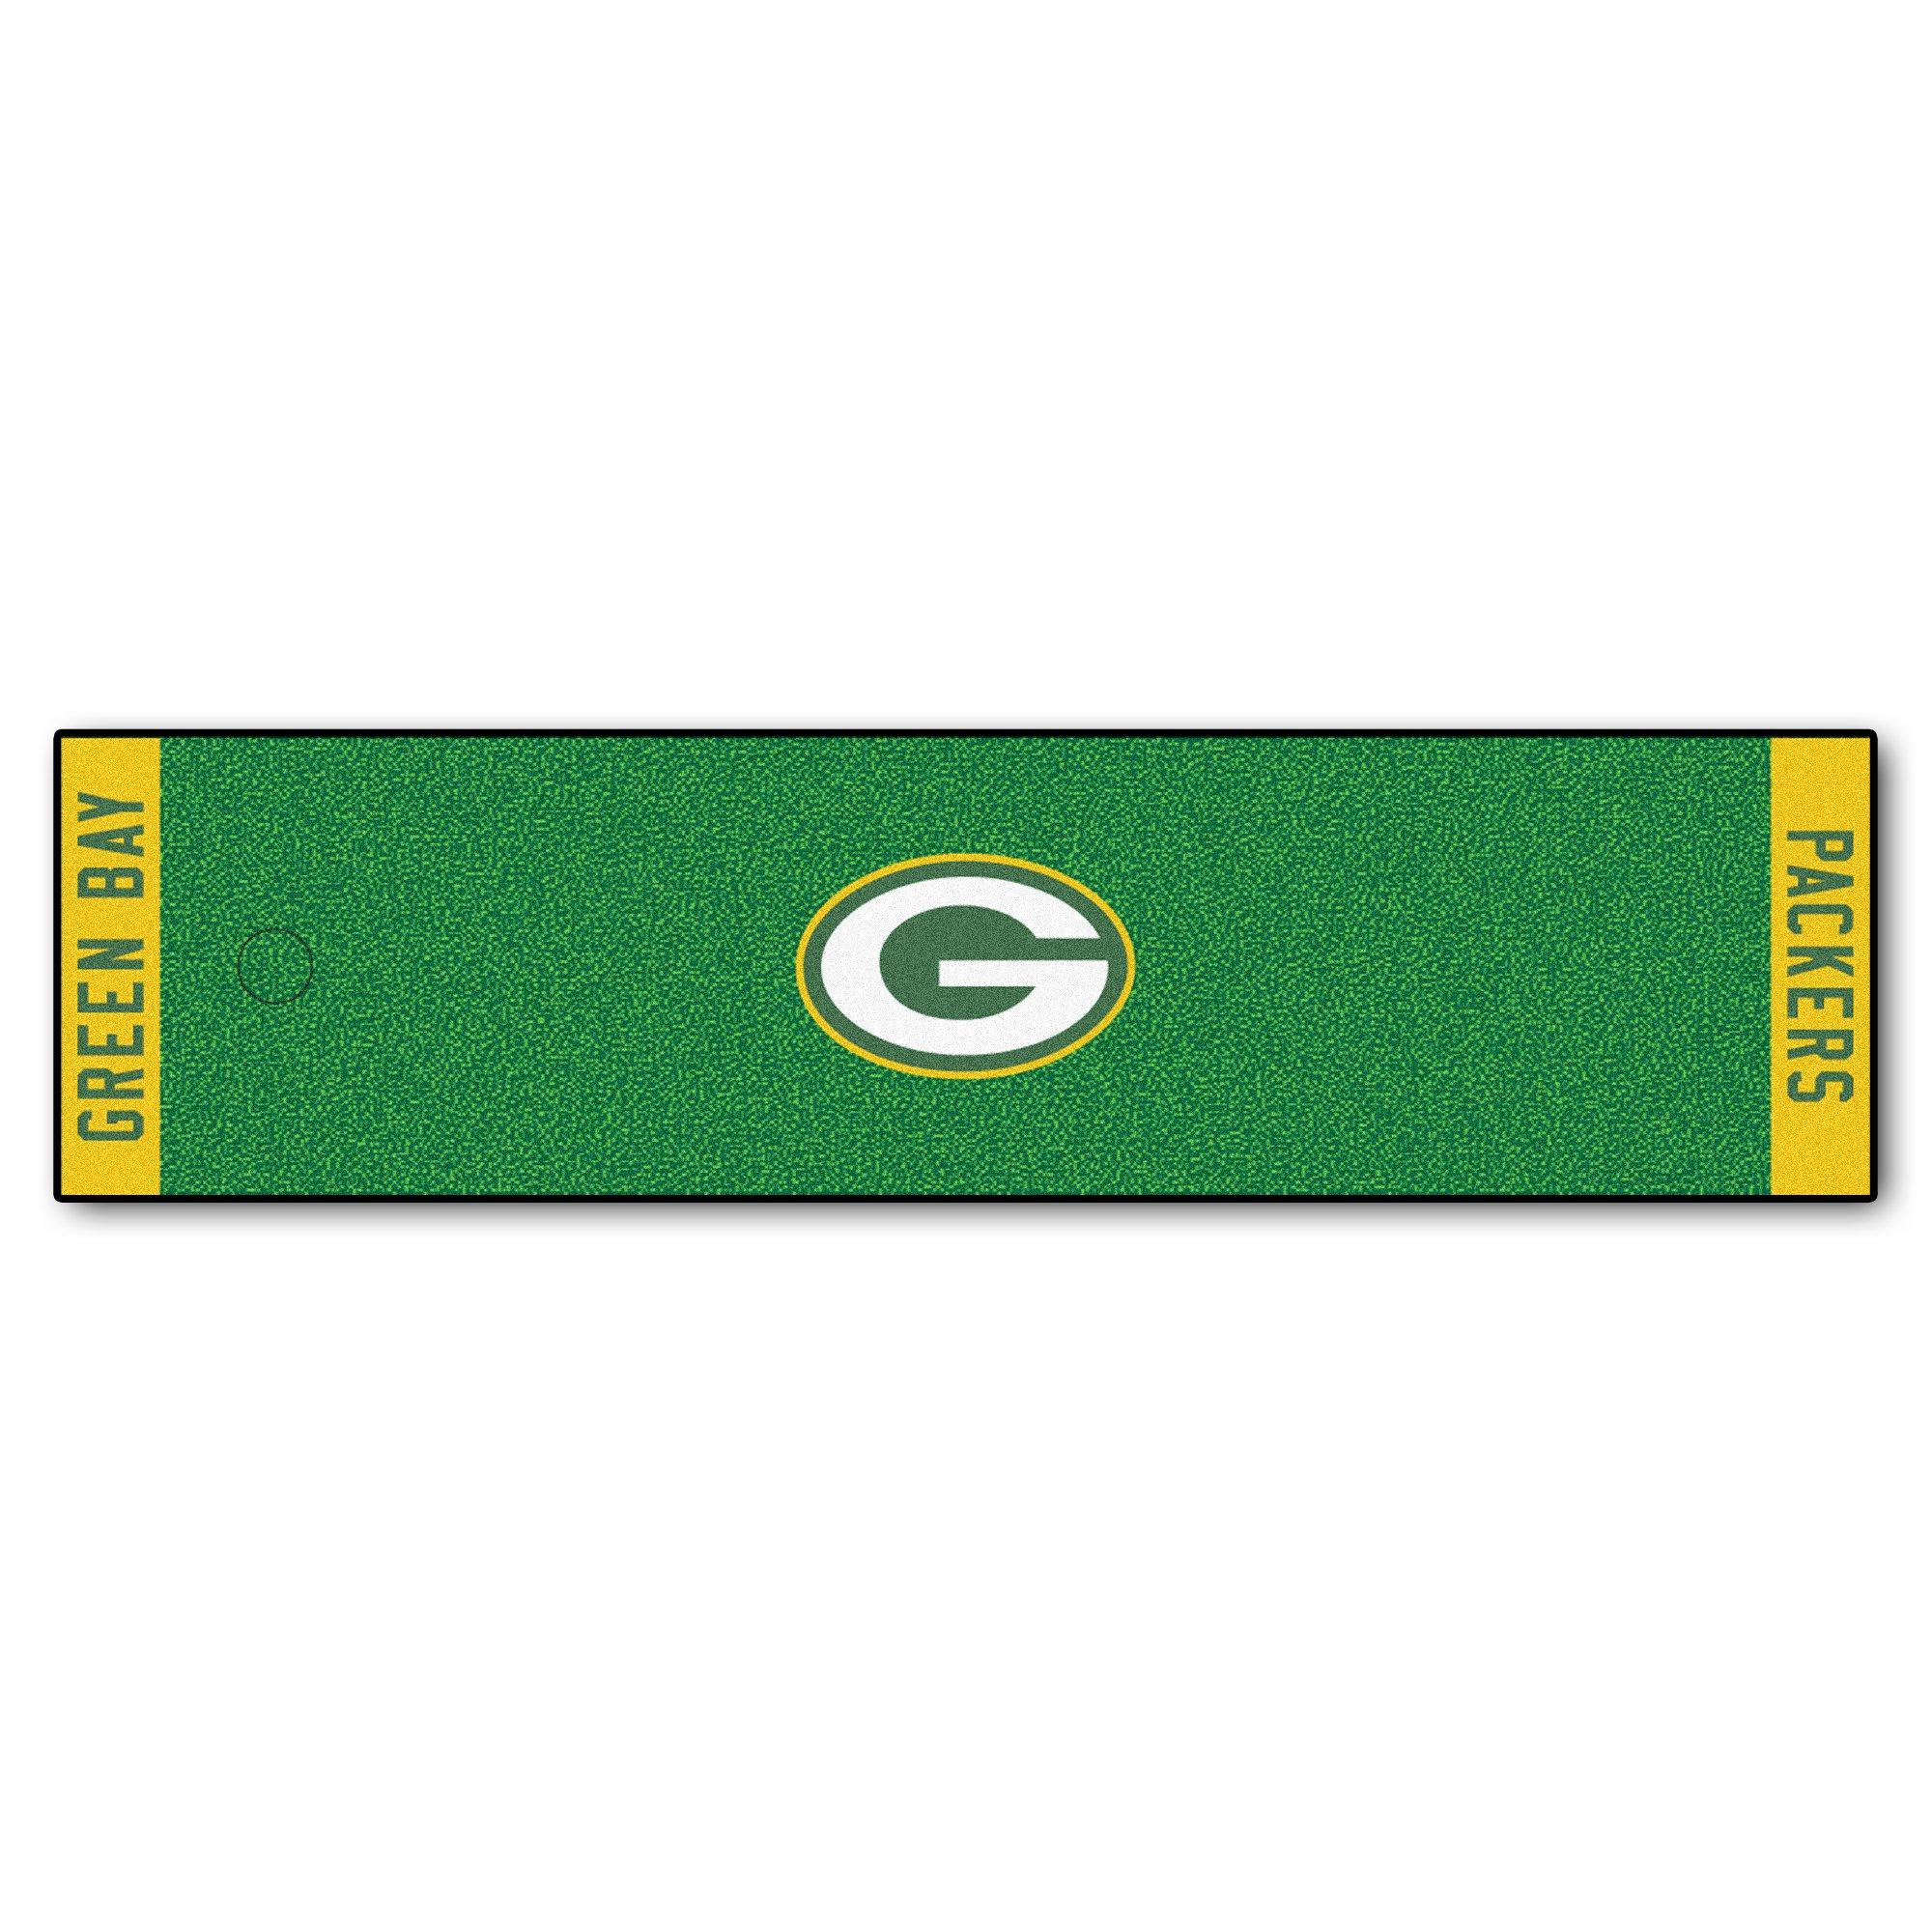 Fanmats NFL Green Bay Packers Nylon Face Putting Green Mat